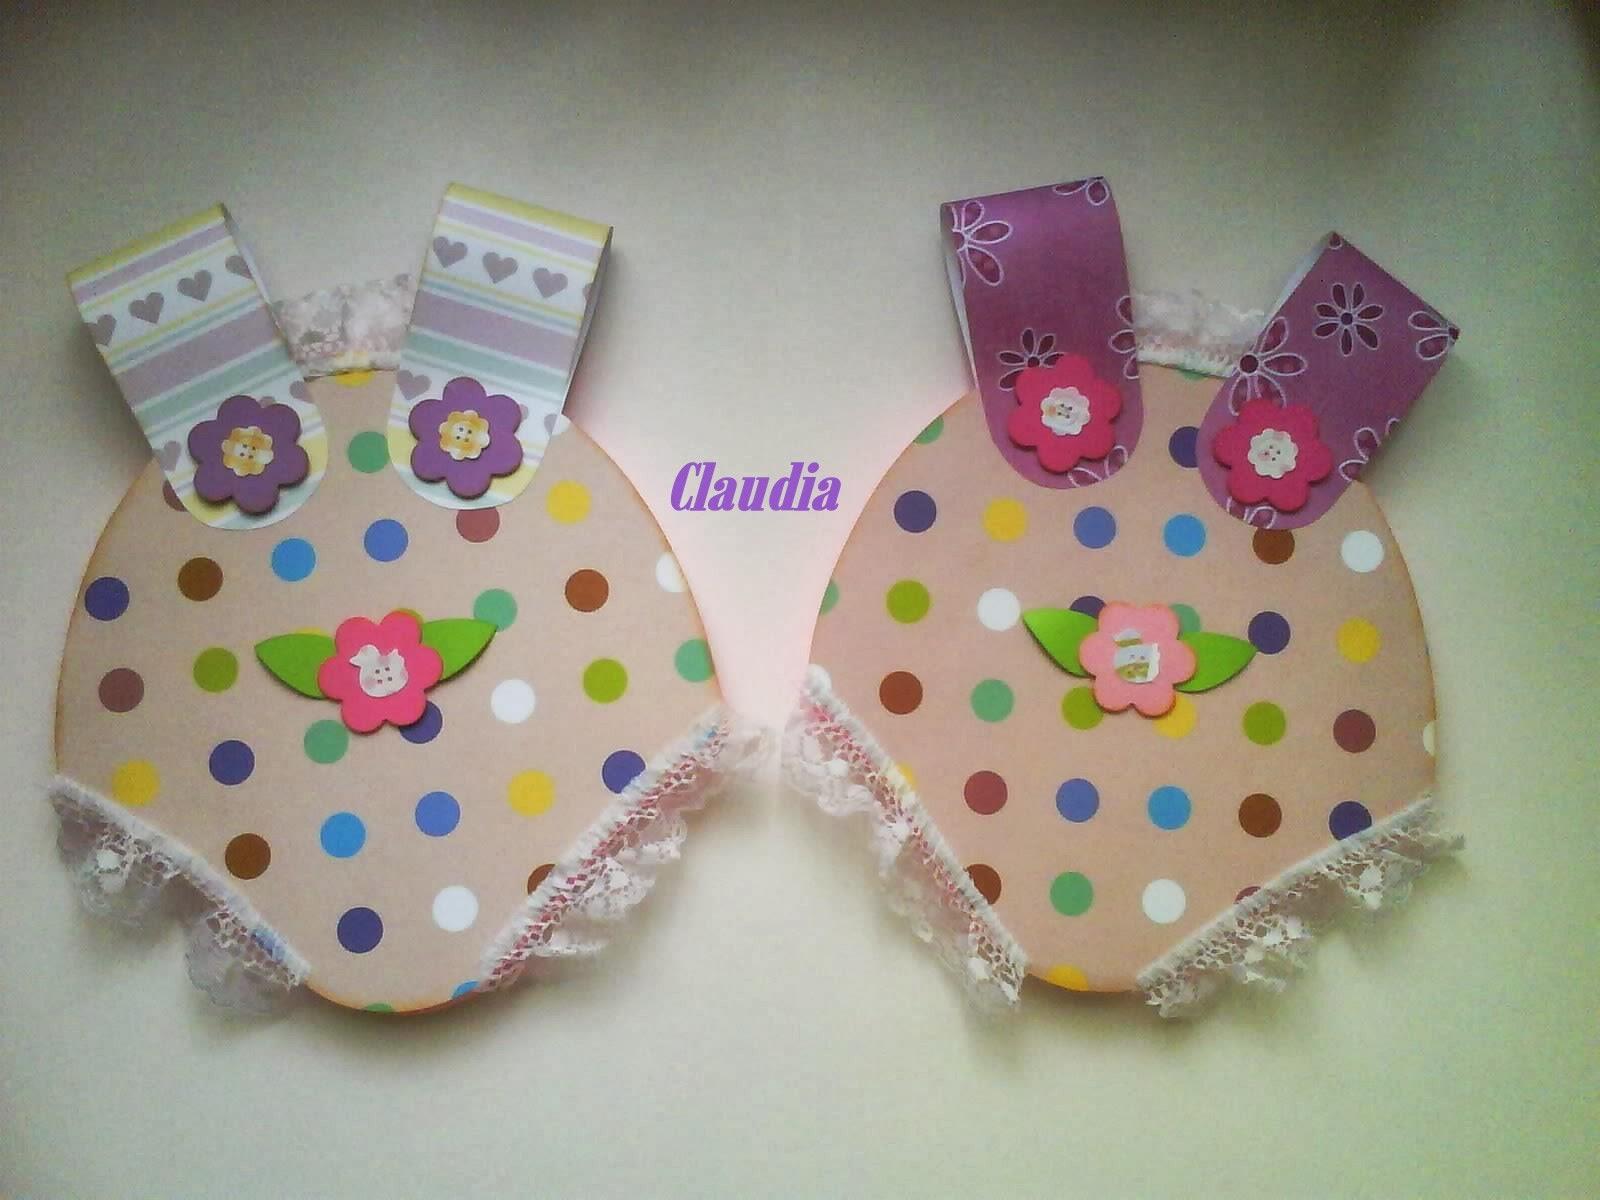 lindas manualidades Tarjetas para Baby shower